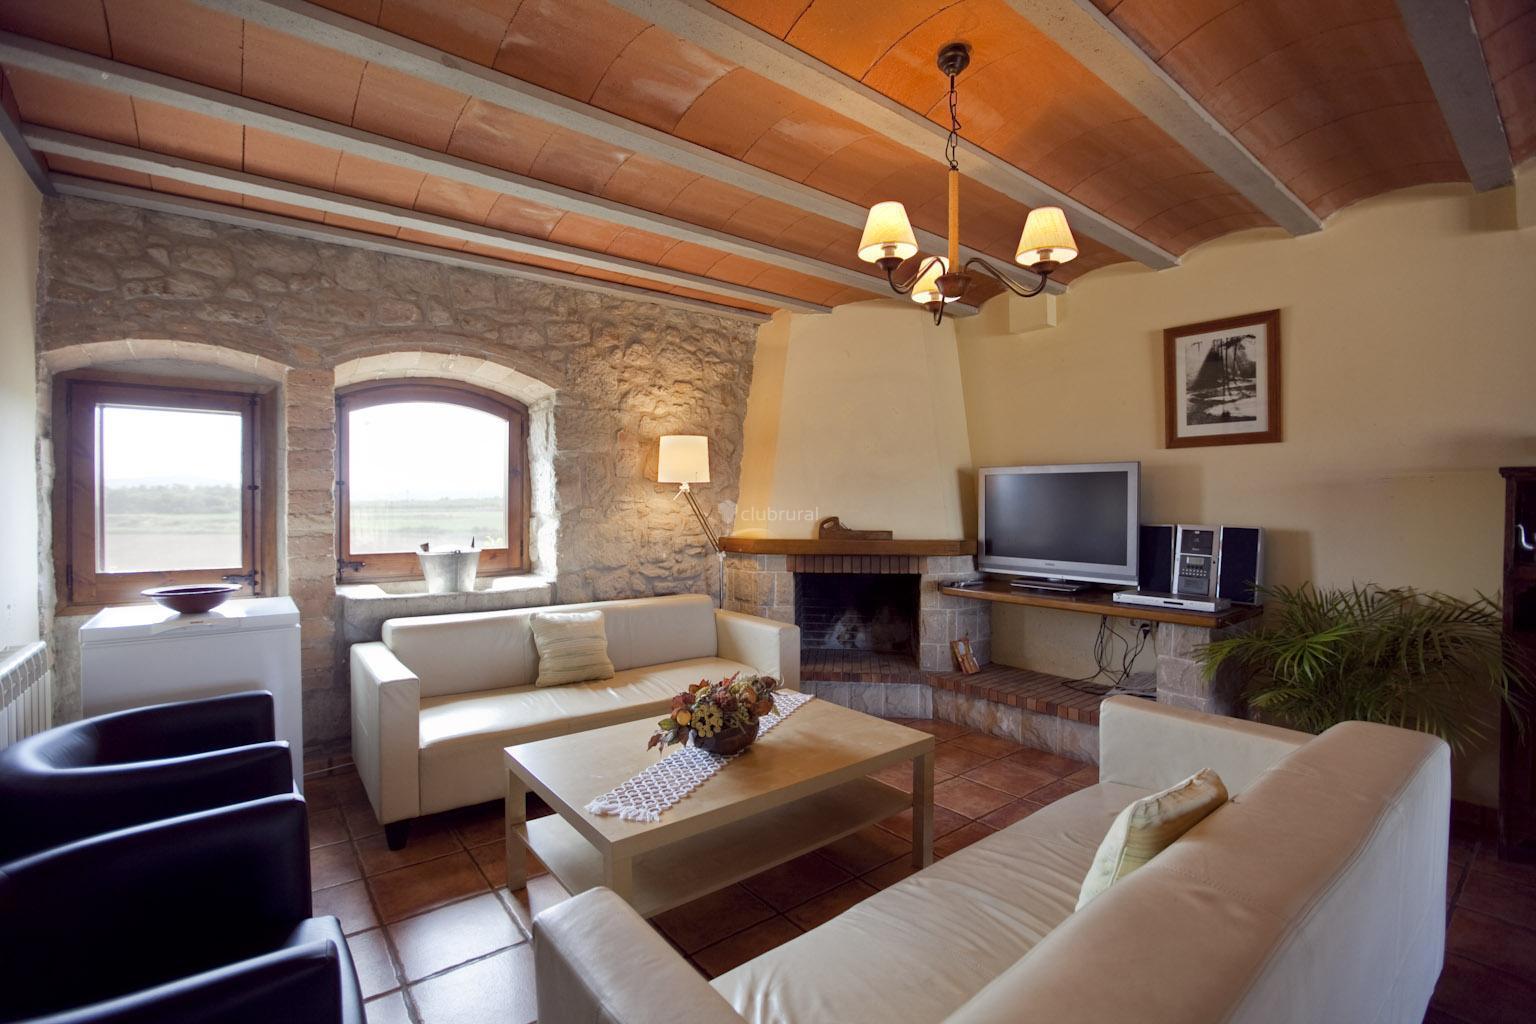 Fotos de Casa Rural Casserres  Barcelona  Casserres